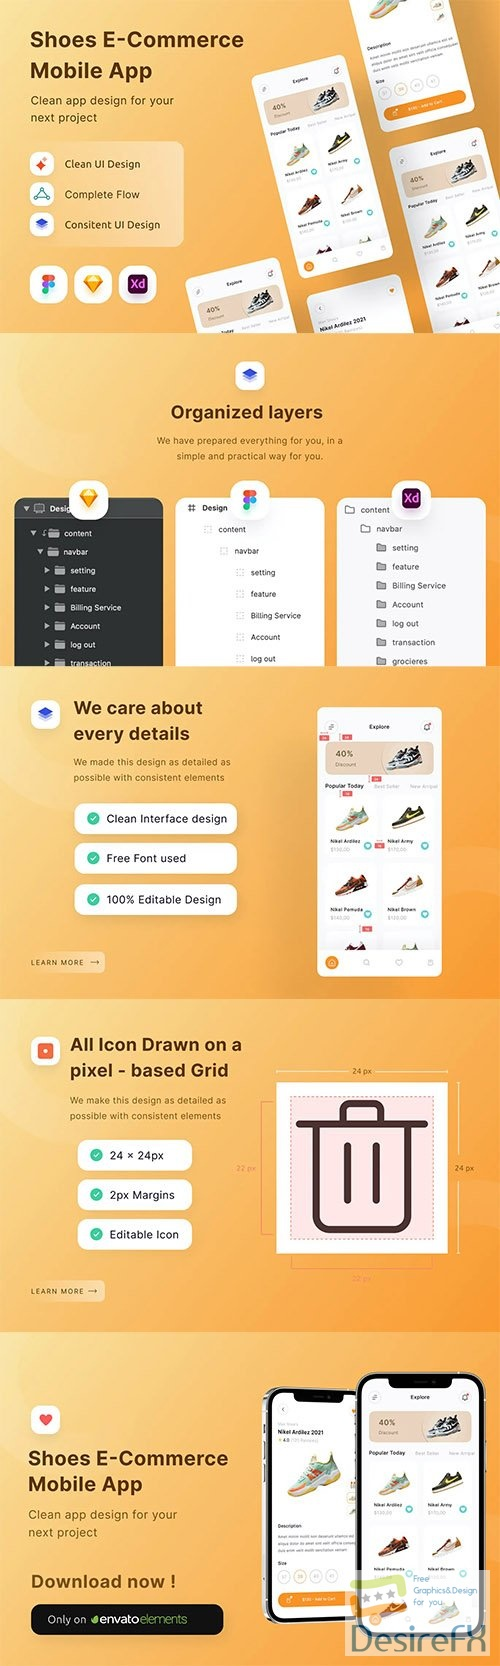 Shoes E-Commerce Mobile App